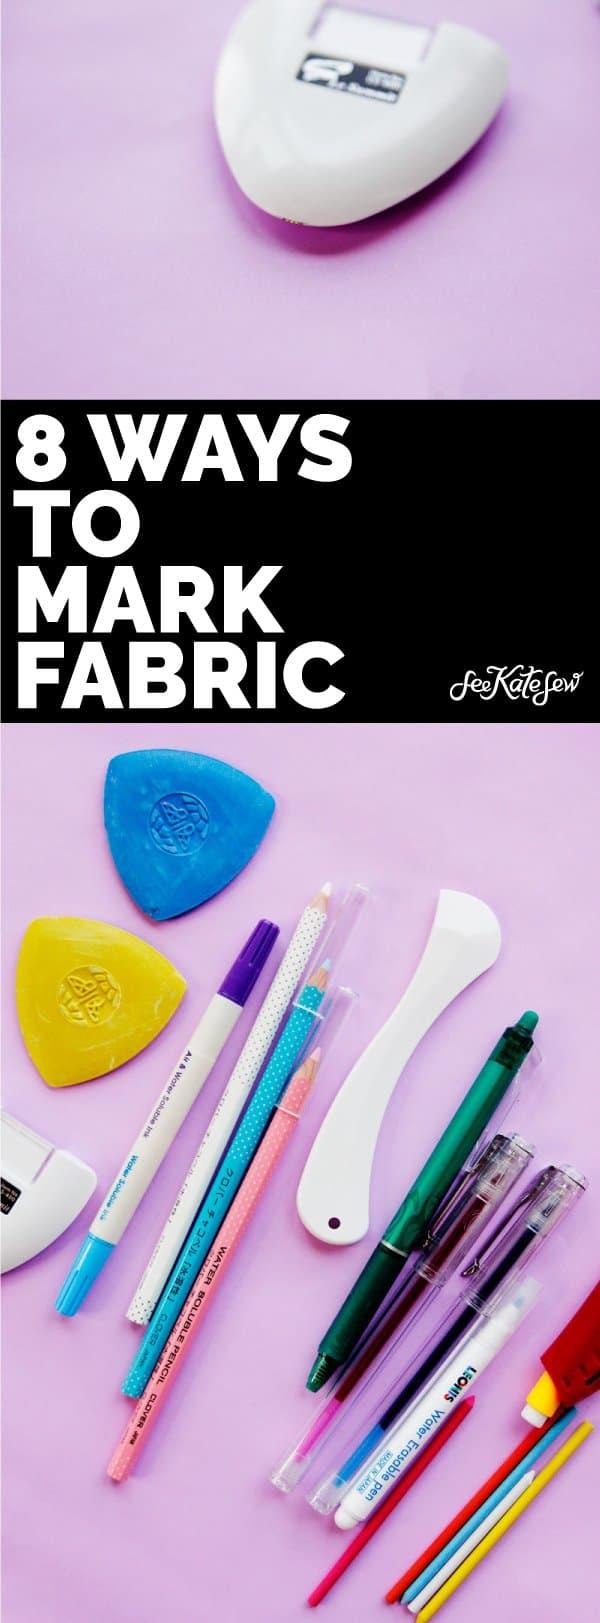 8 ways to mark fabric